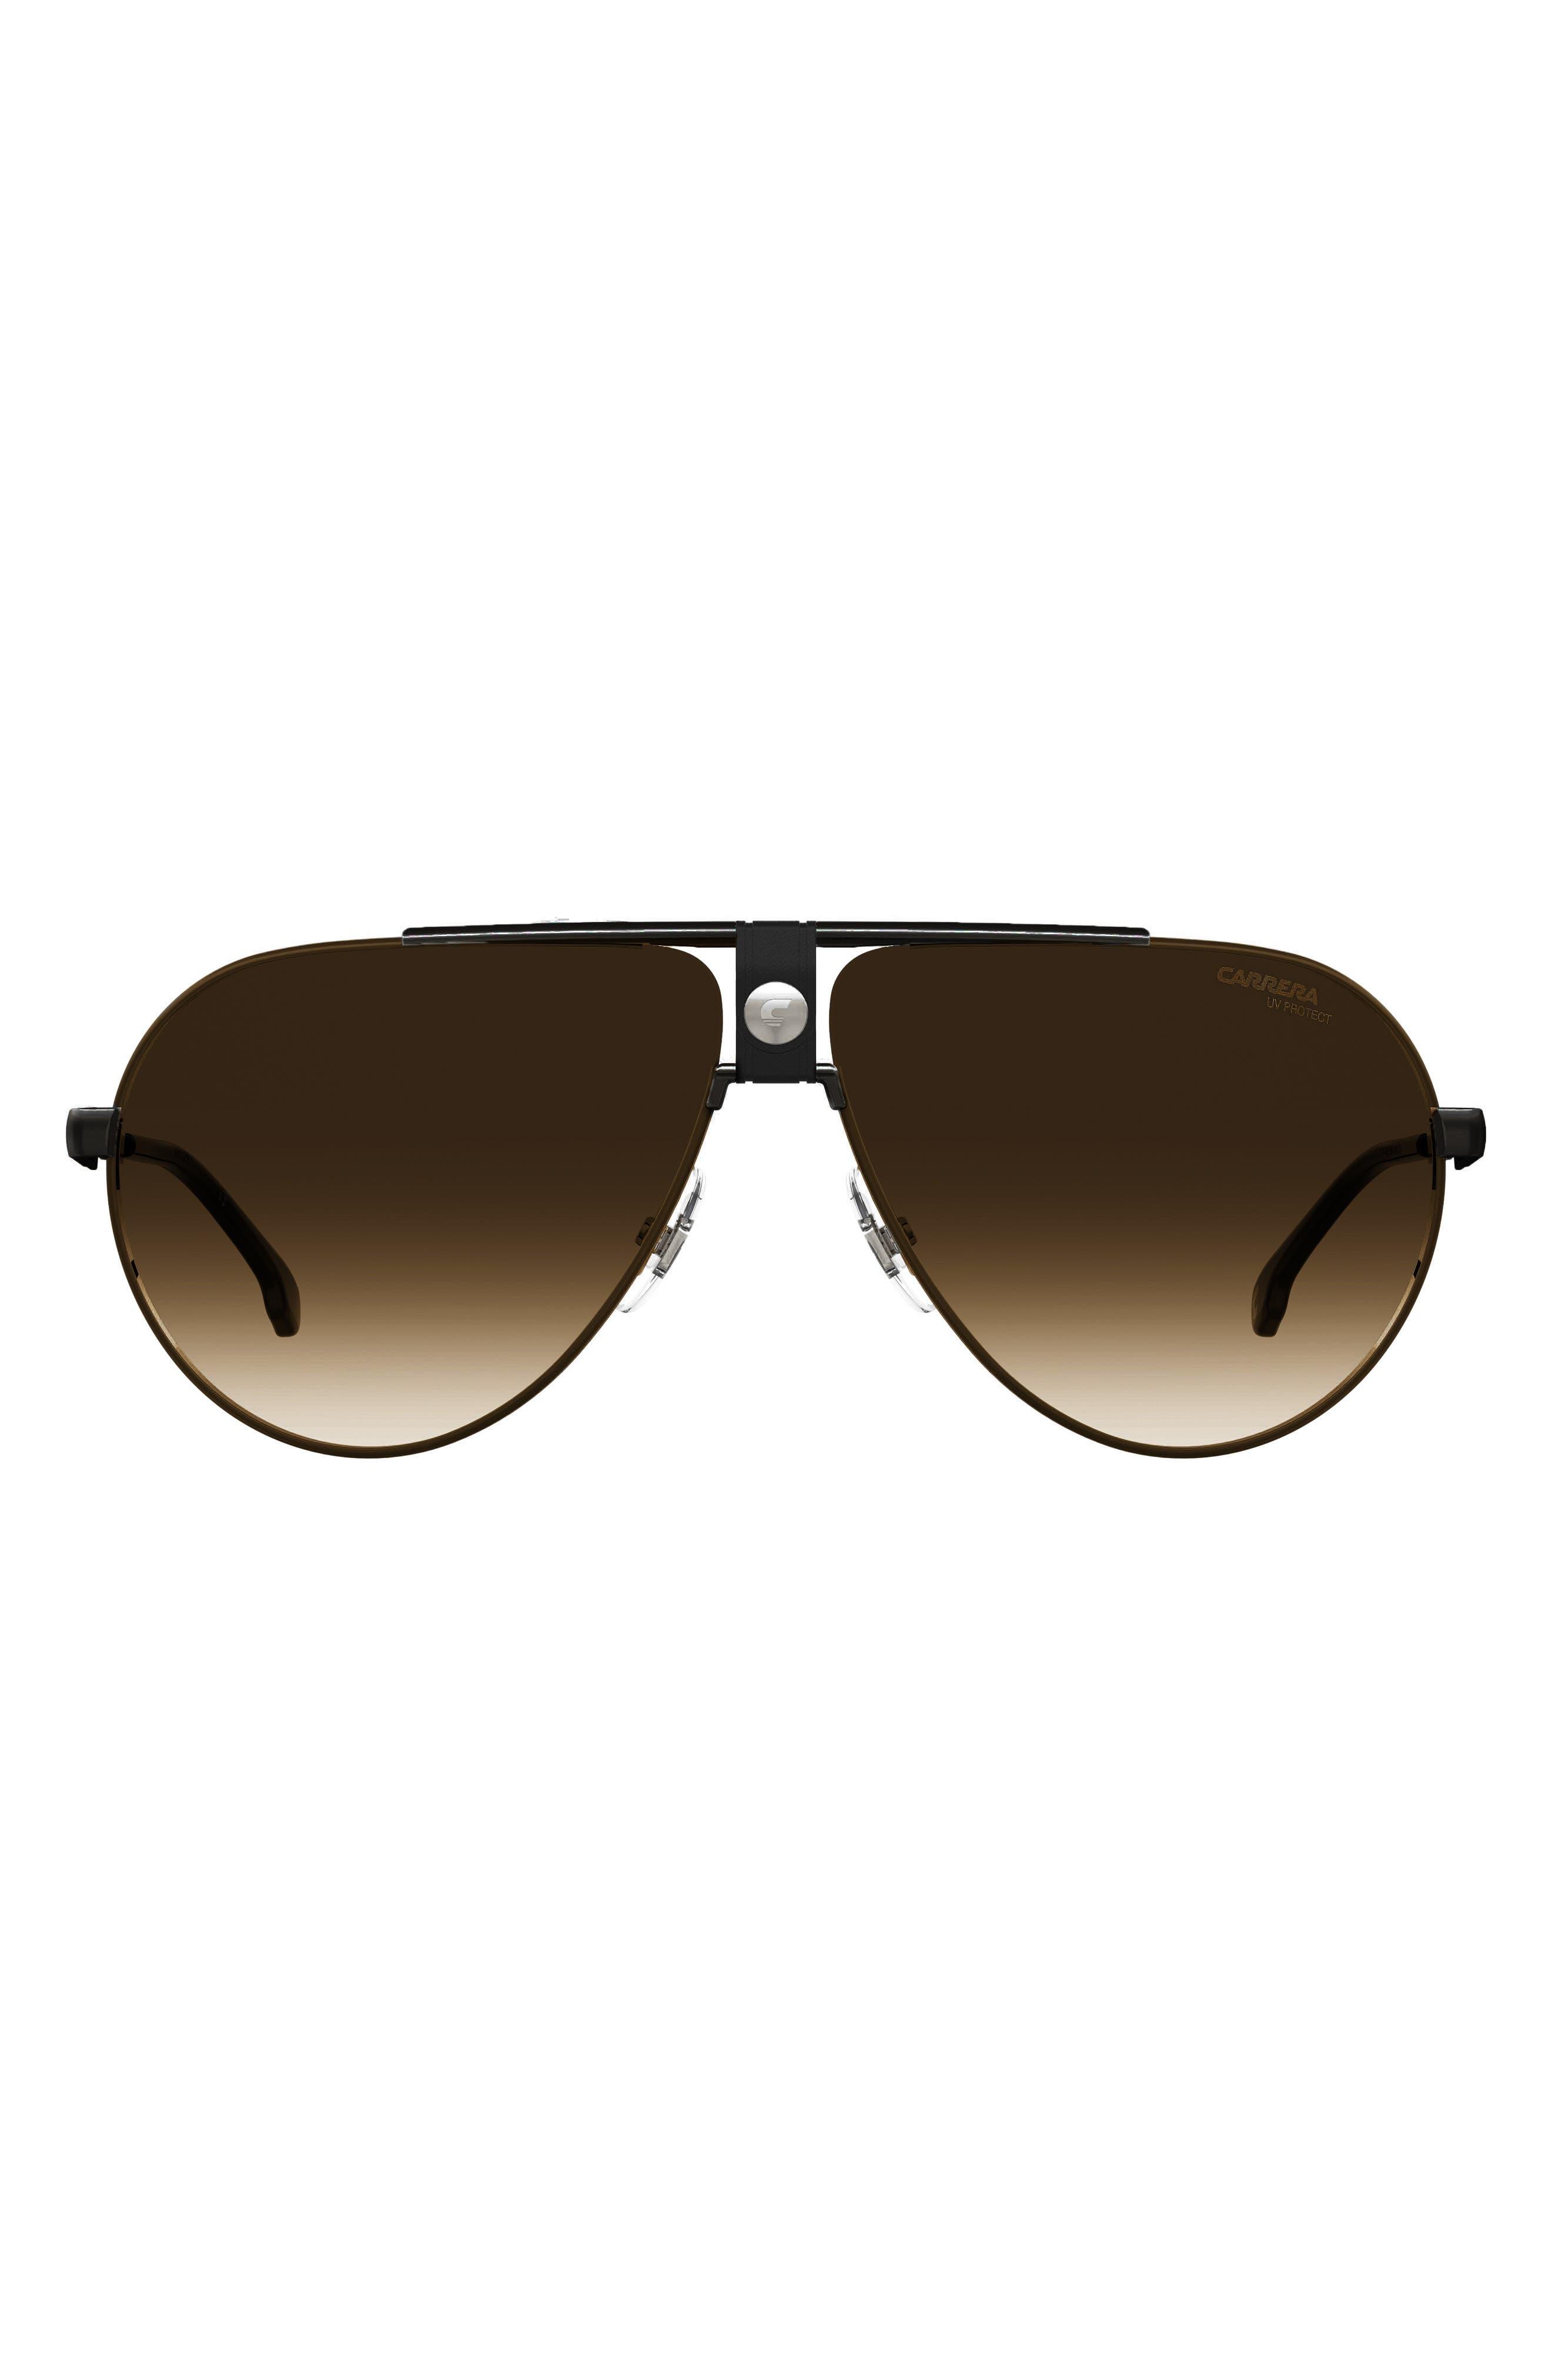 63mm Polarized Gradient Oversize Aviator Sunglasses